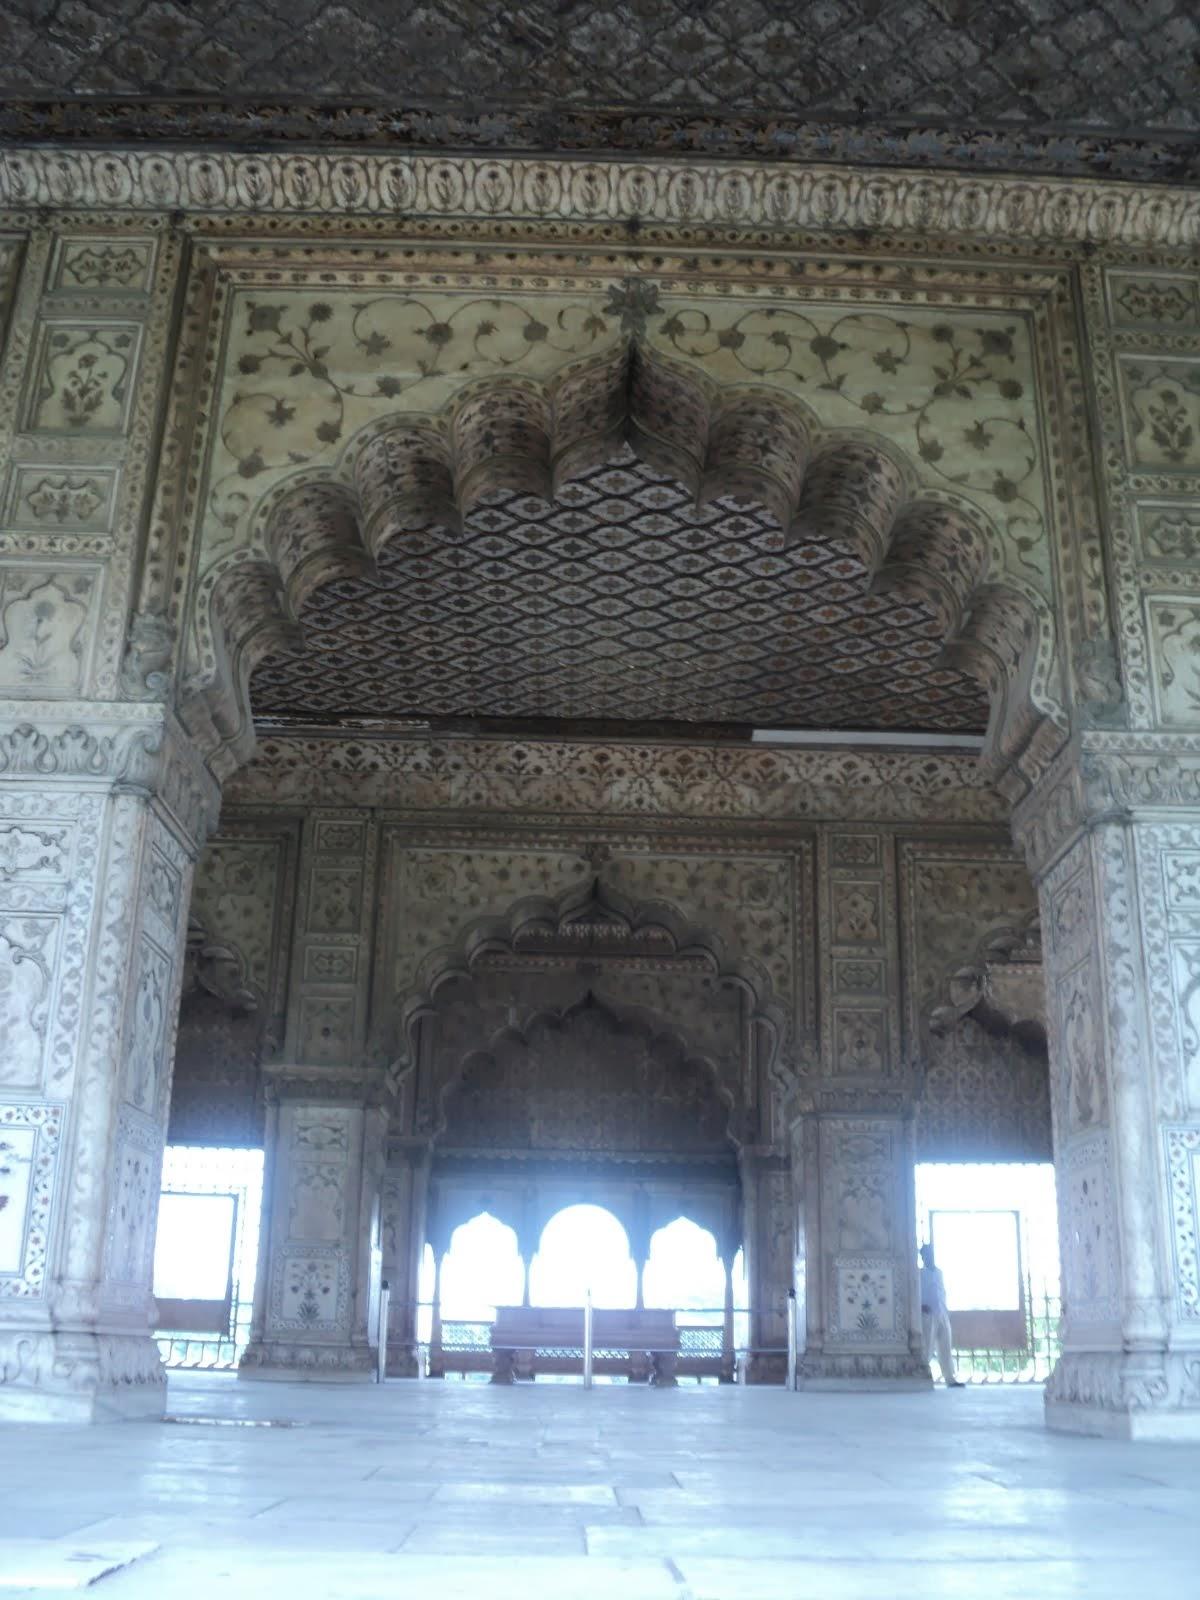 Diwan - i - khas in Lal Qila